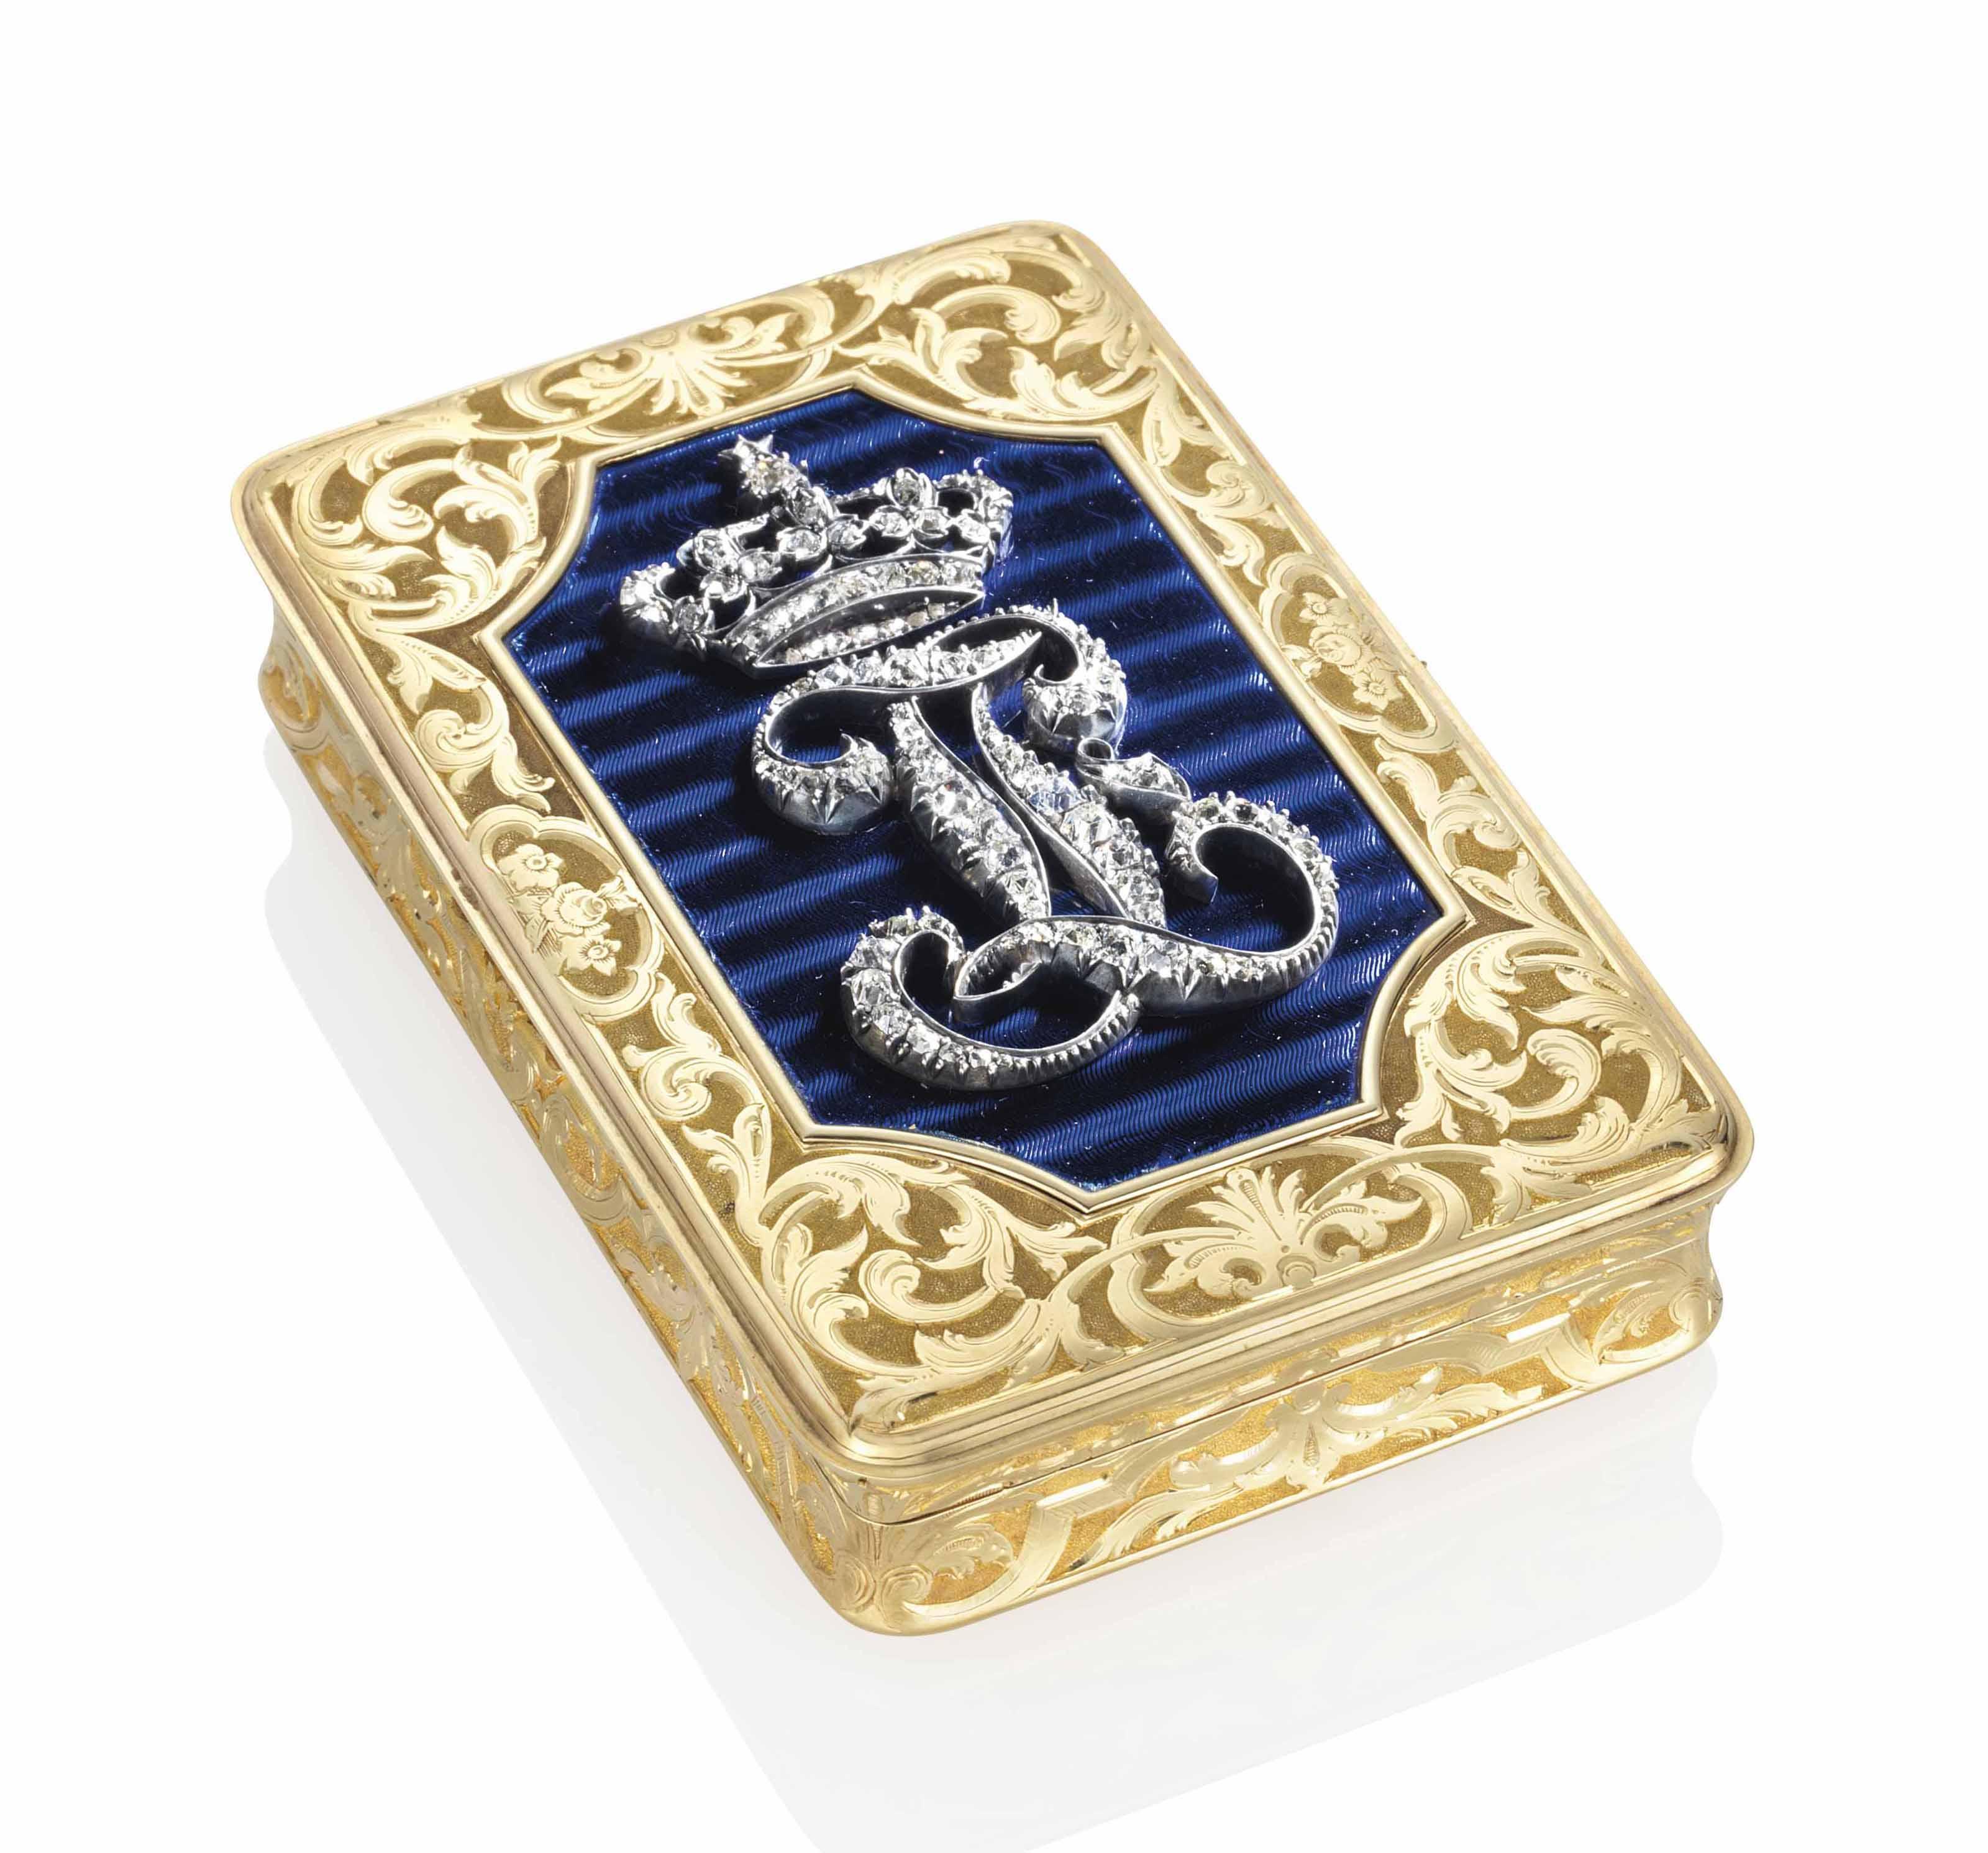 A FRENCH JEWELLED ENAMELLED GOLD ROYAL PRESENTATION SNUFF-BOX